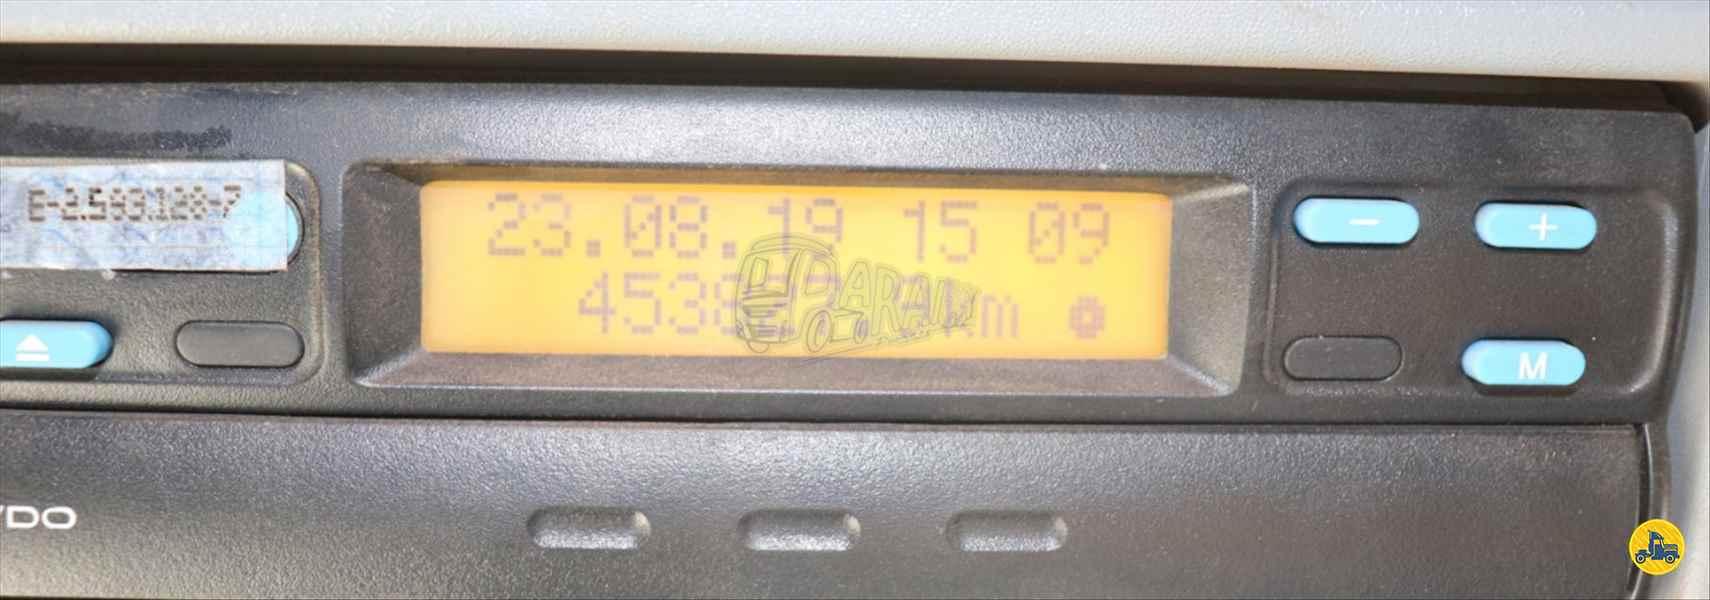 MERCEDES-BENZ MB 1933 45000km 2013/2013 Paraíso Pesados